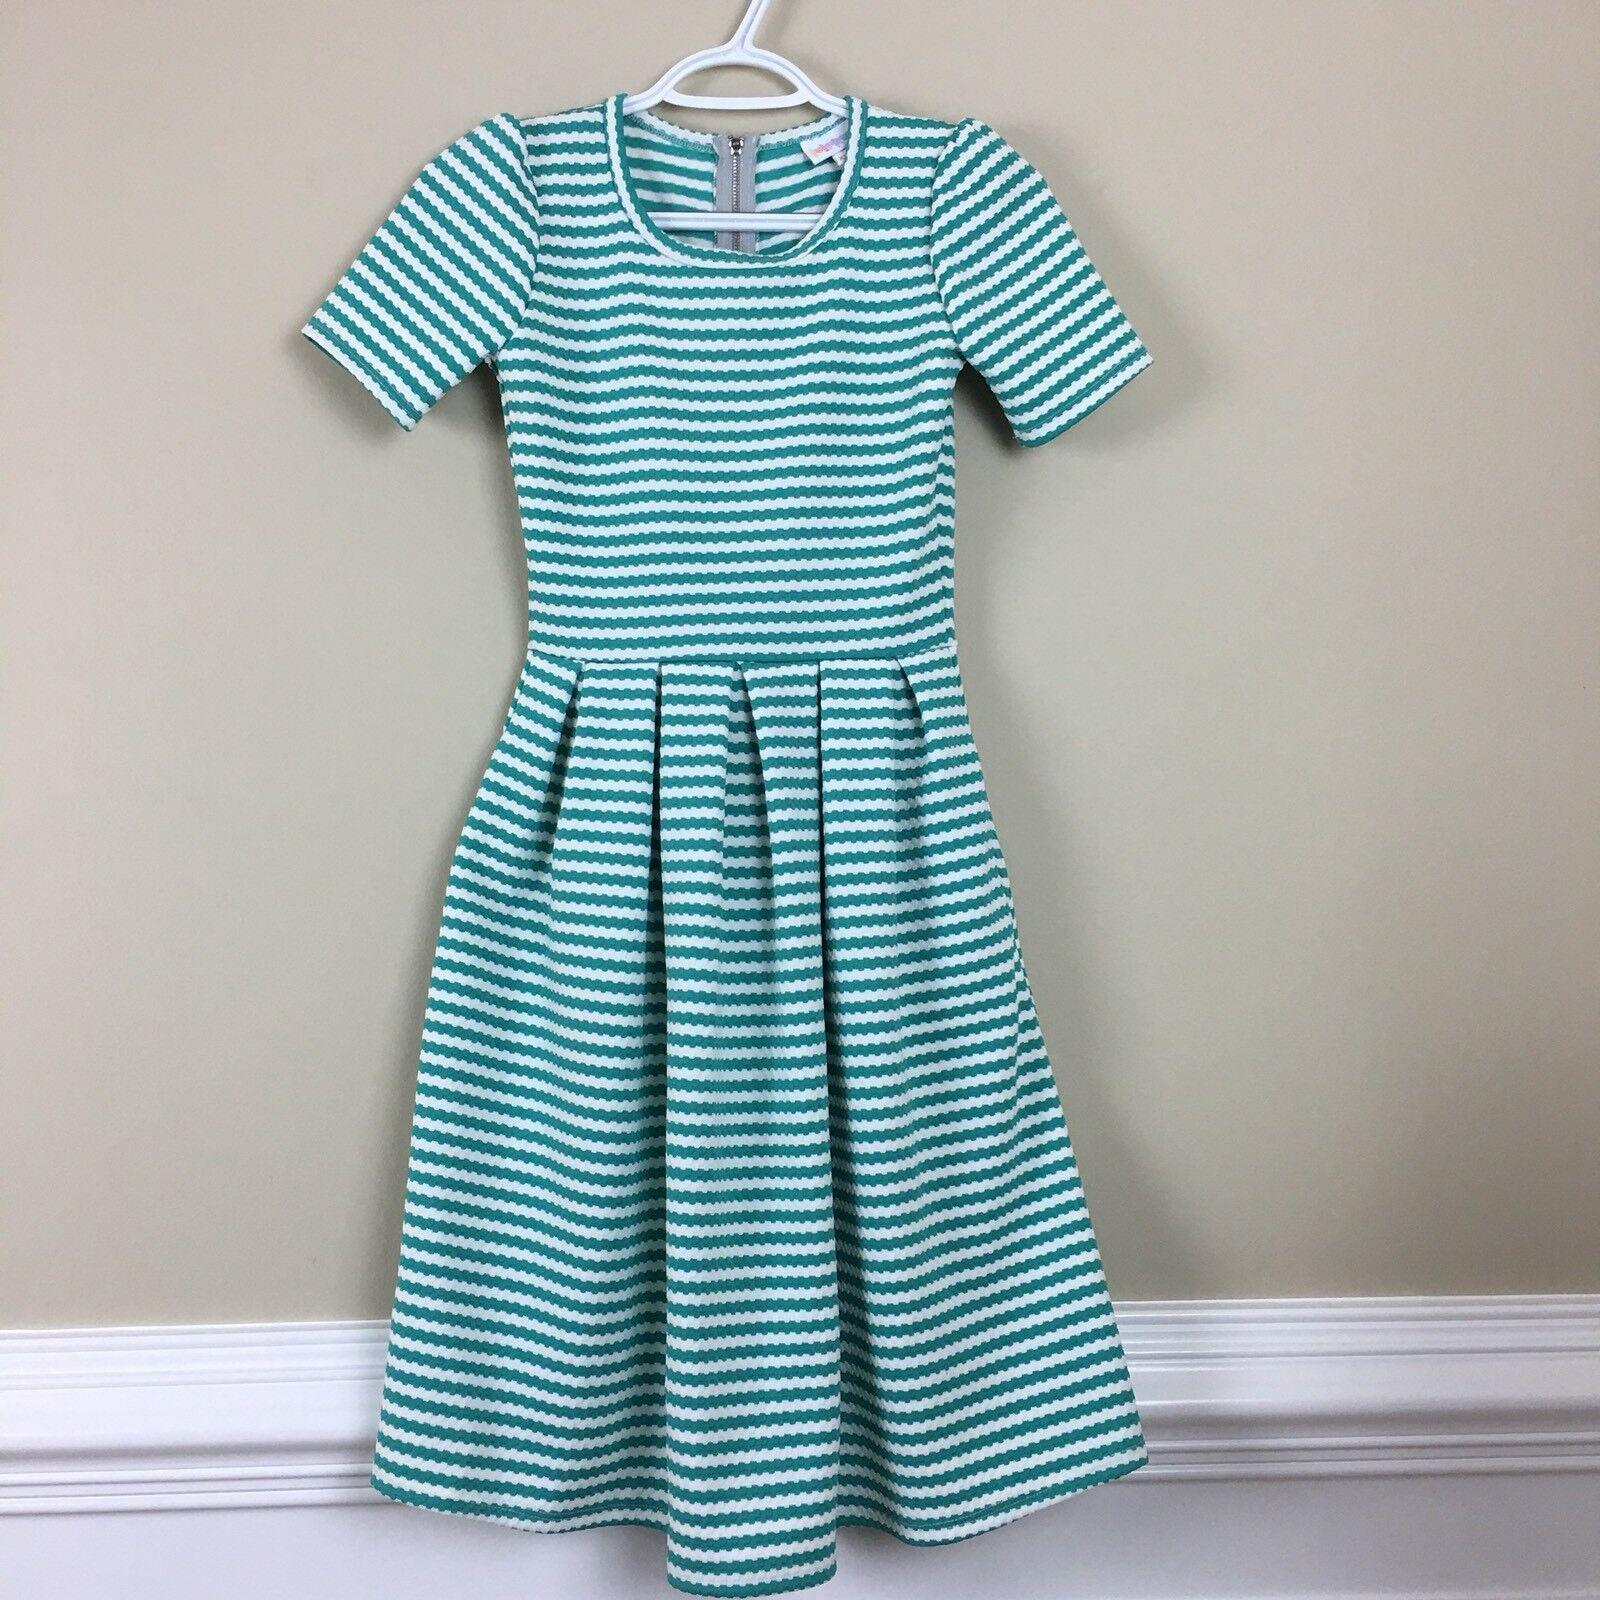 LuLaRoe Green Striped Short Sleeves Dress XXS